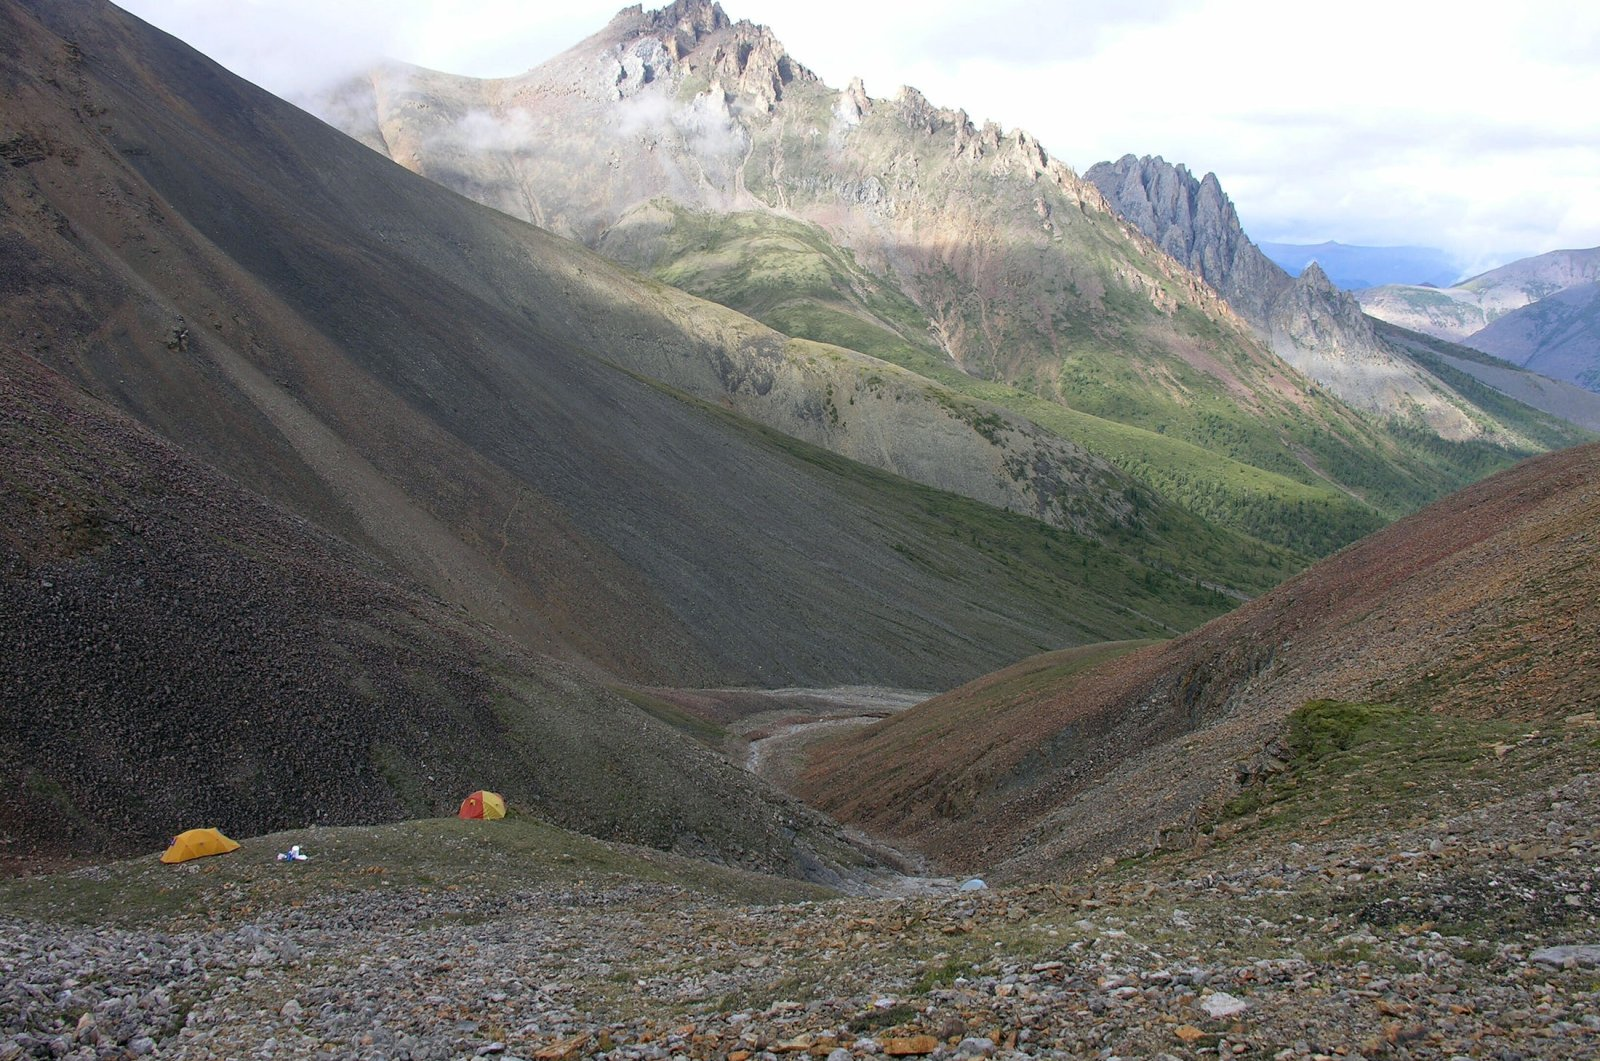 planet daily dawn northamerica animal country giving earth fossil region canada life worldlynewsonline